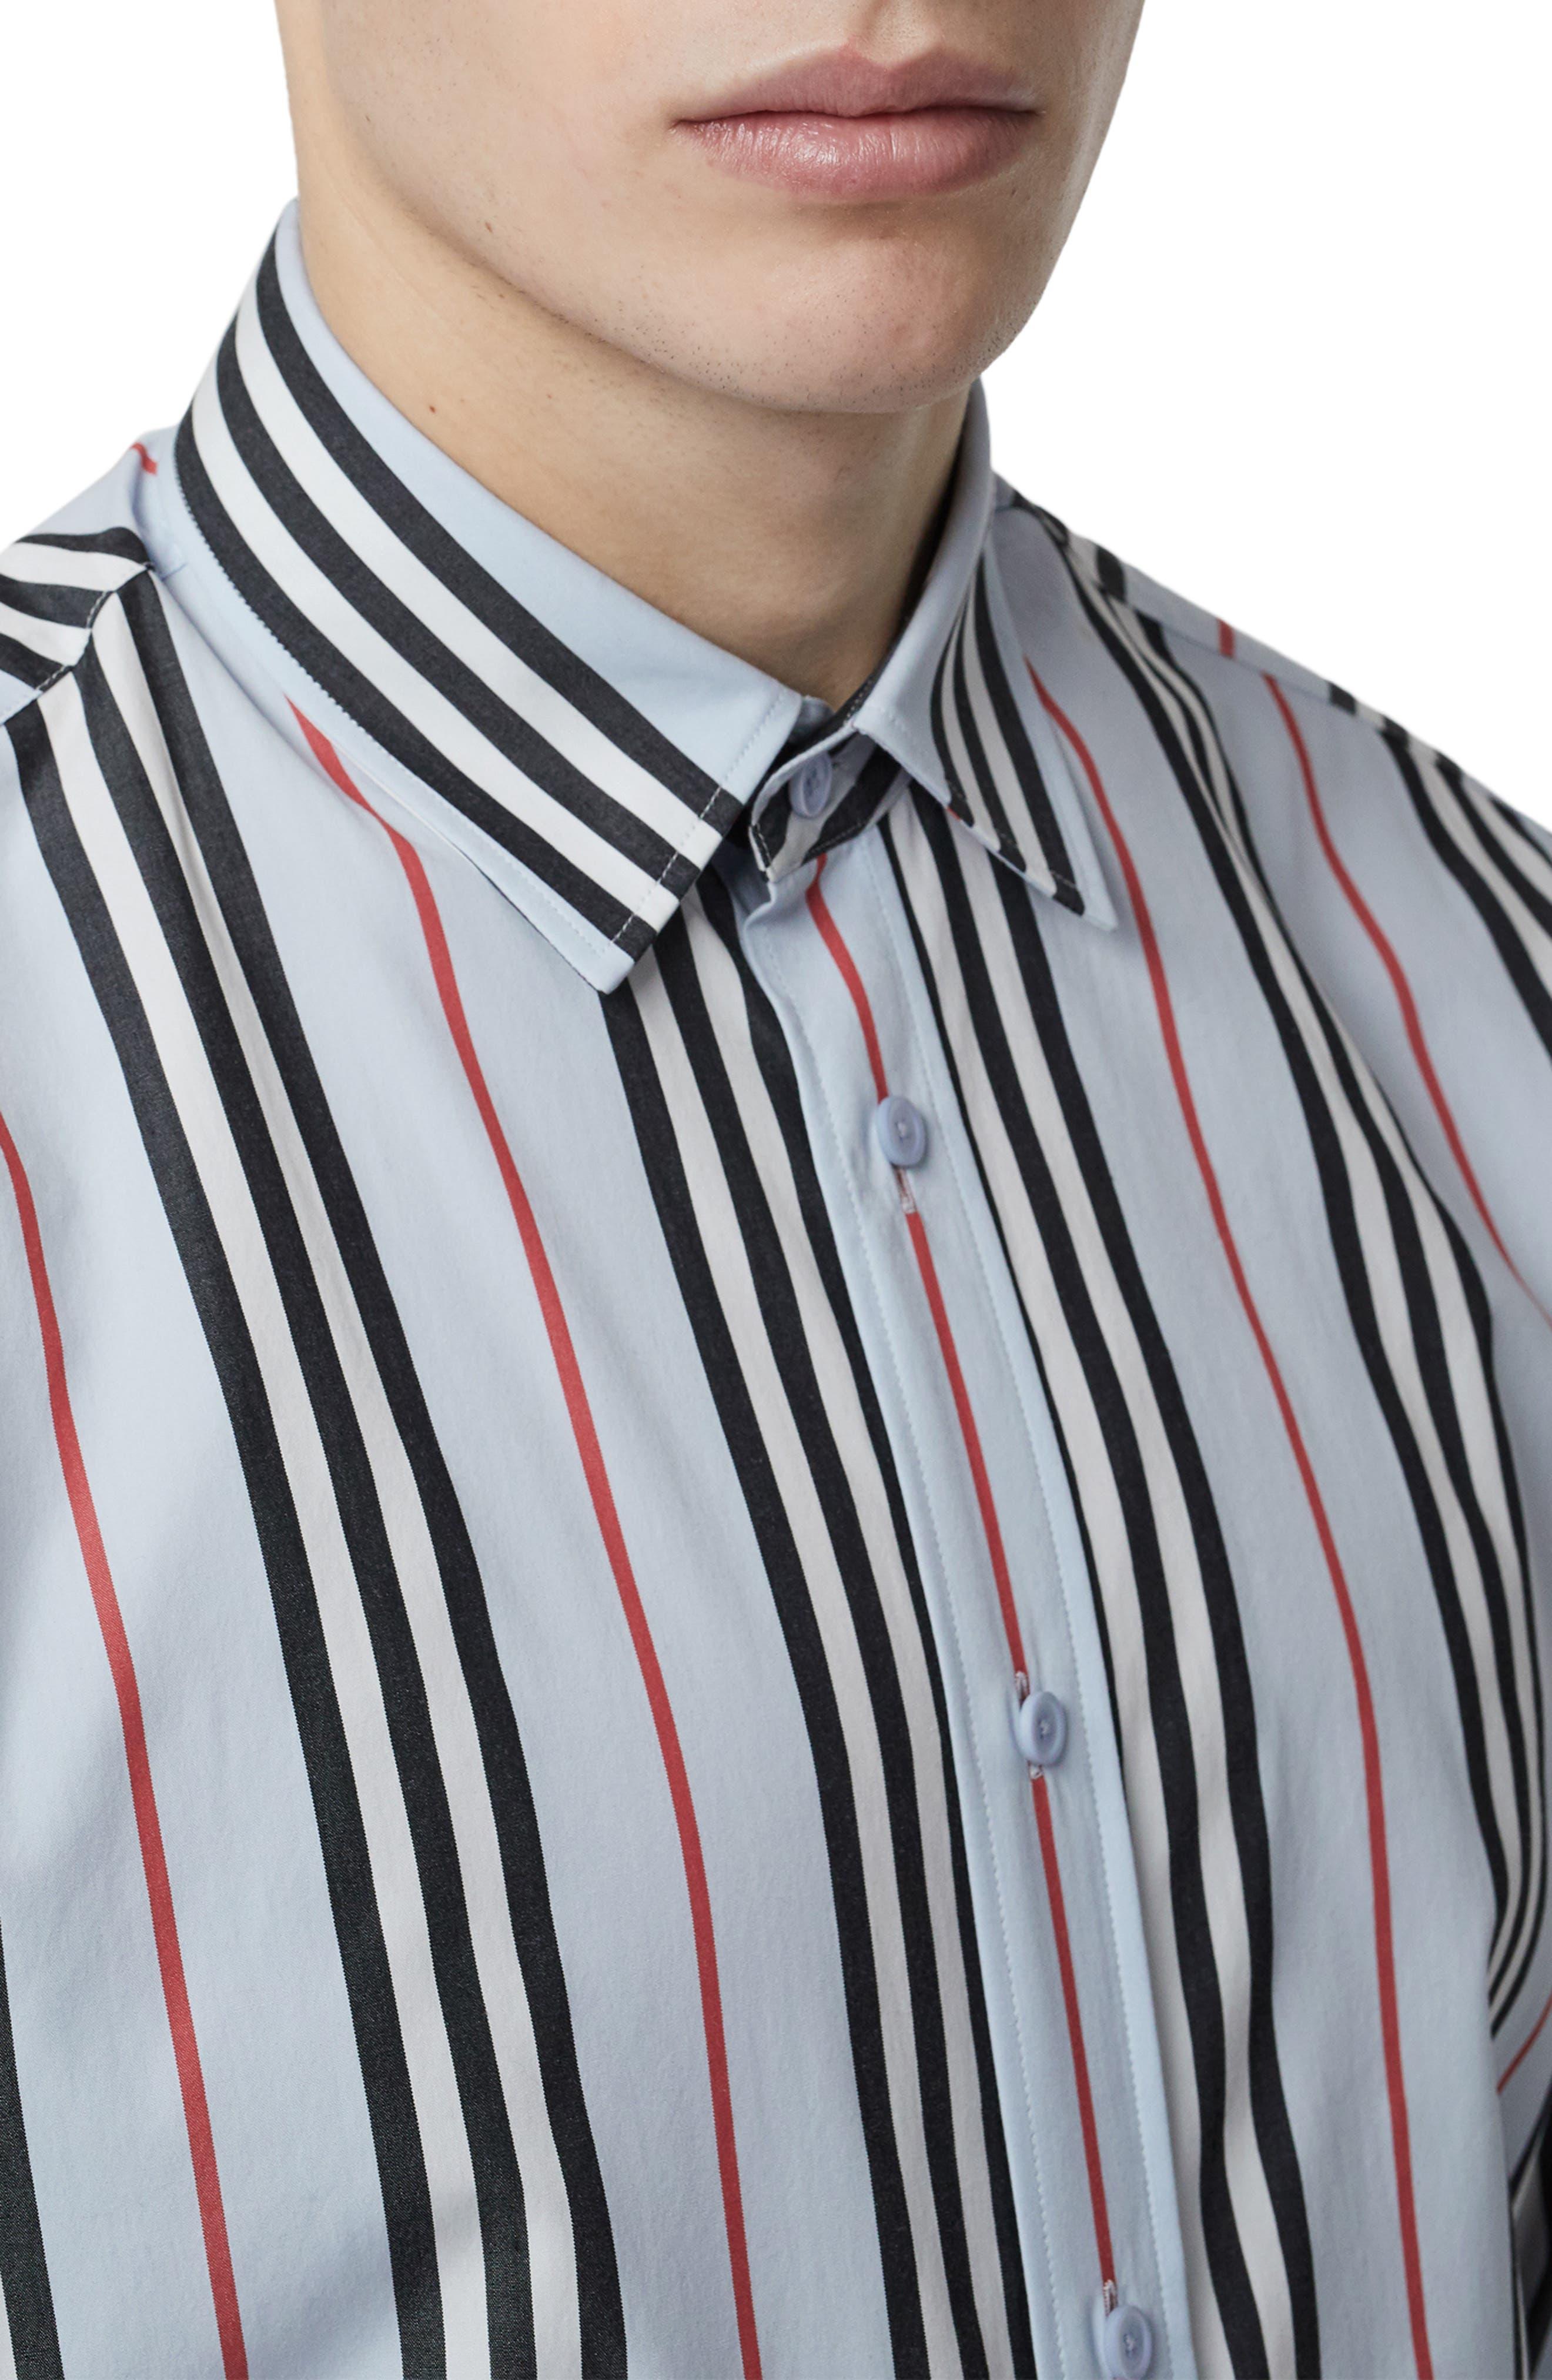 BURBERRY, Icon Stripe Shirt, Alternate thumbnail 2, color, PALE BLUE